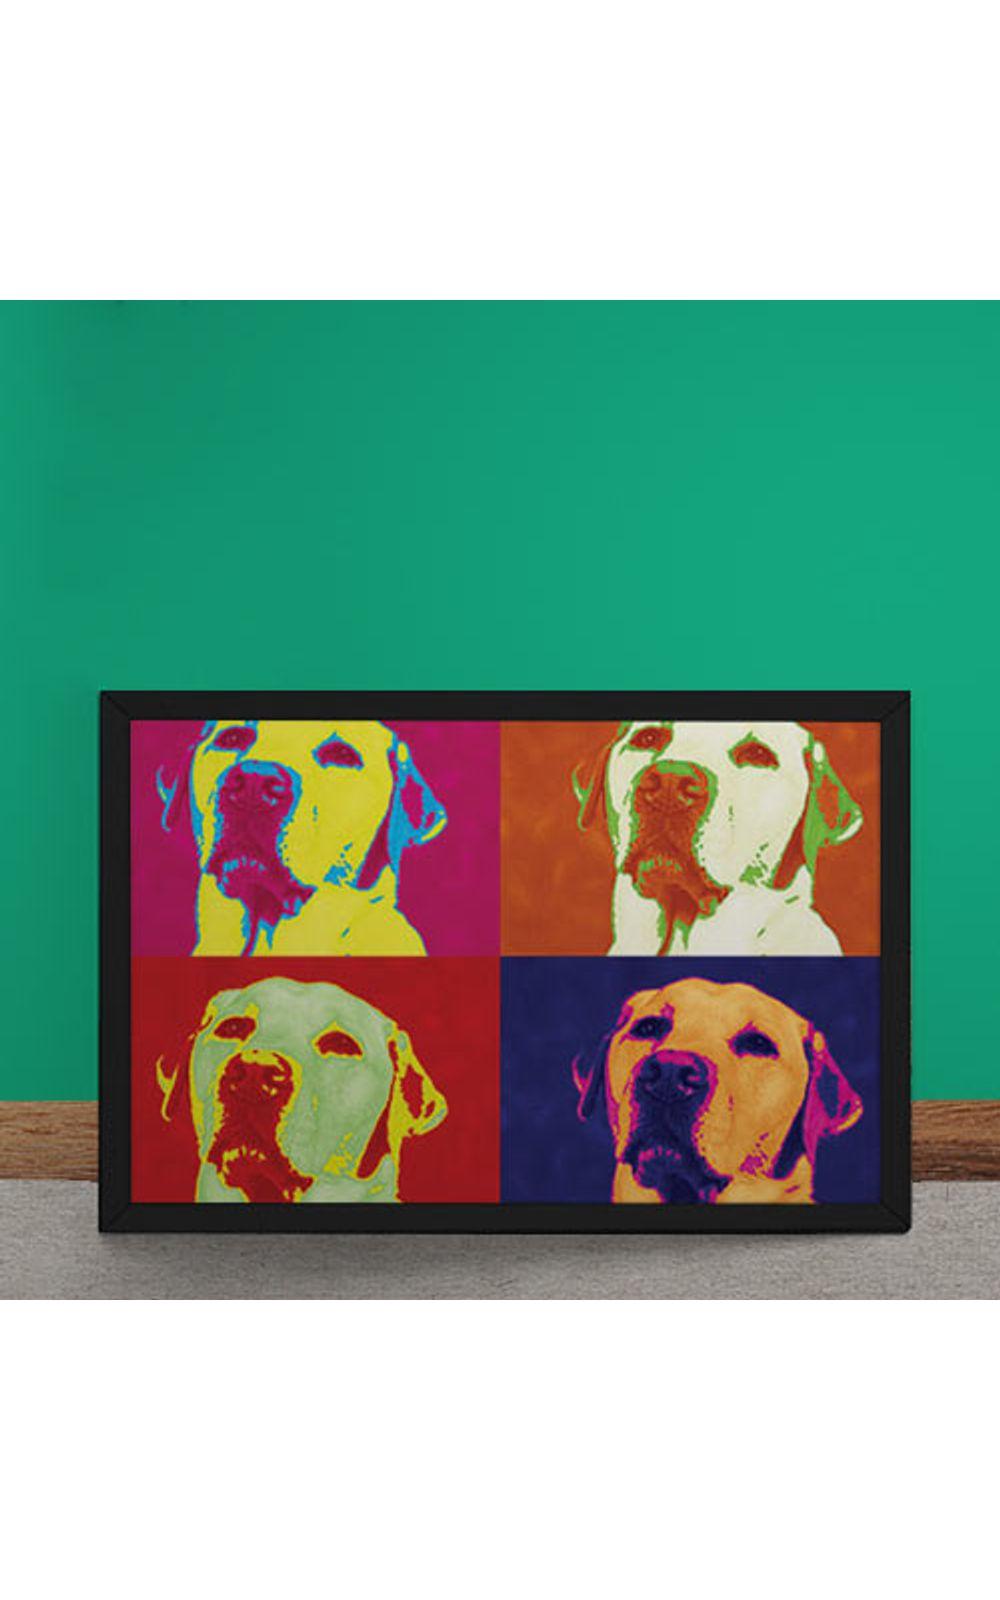 Foto 2 - Quadro Decorativo Andy Warhol Pop Art Cachorro Labrador